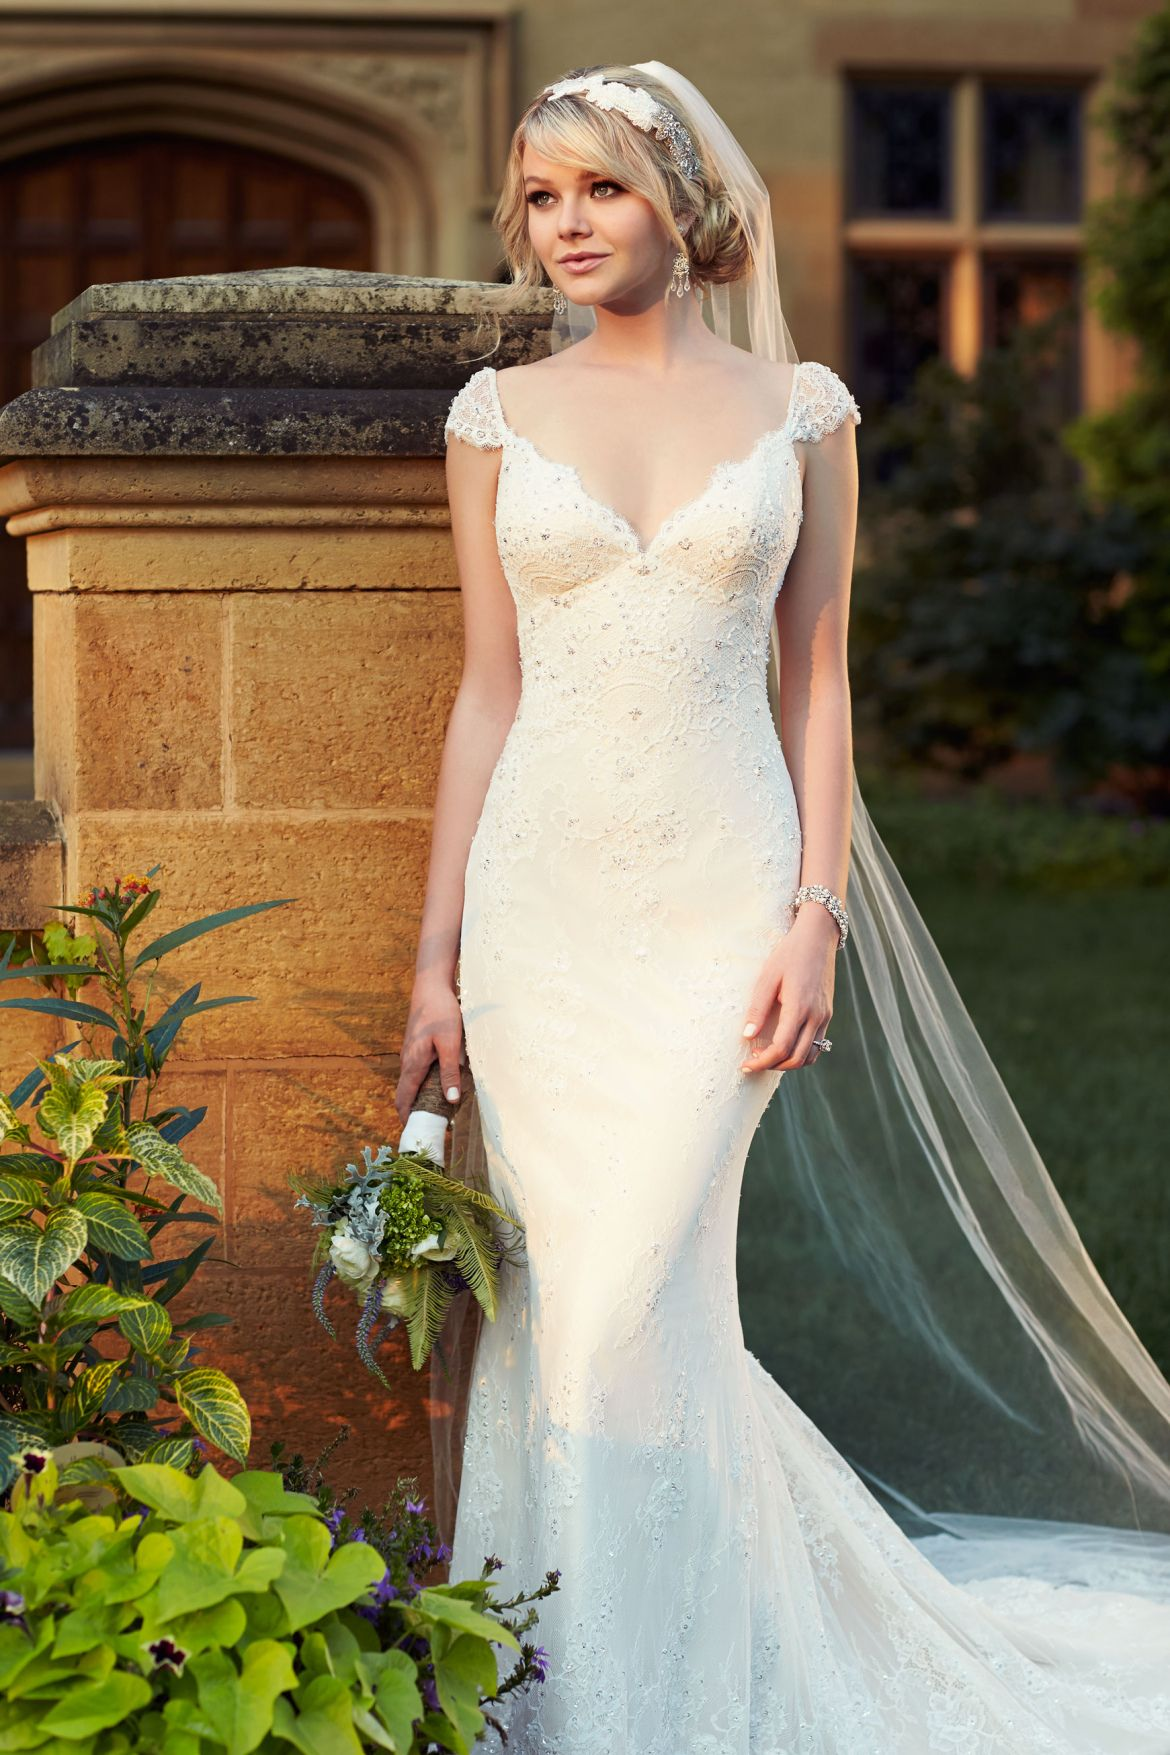 The lightbox wedding dresses   Best Wedding Dresses Australia  Wedding Dresses for the Mature